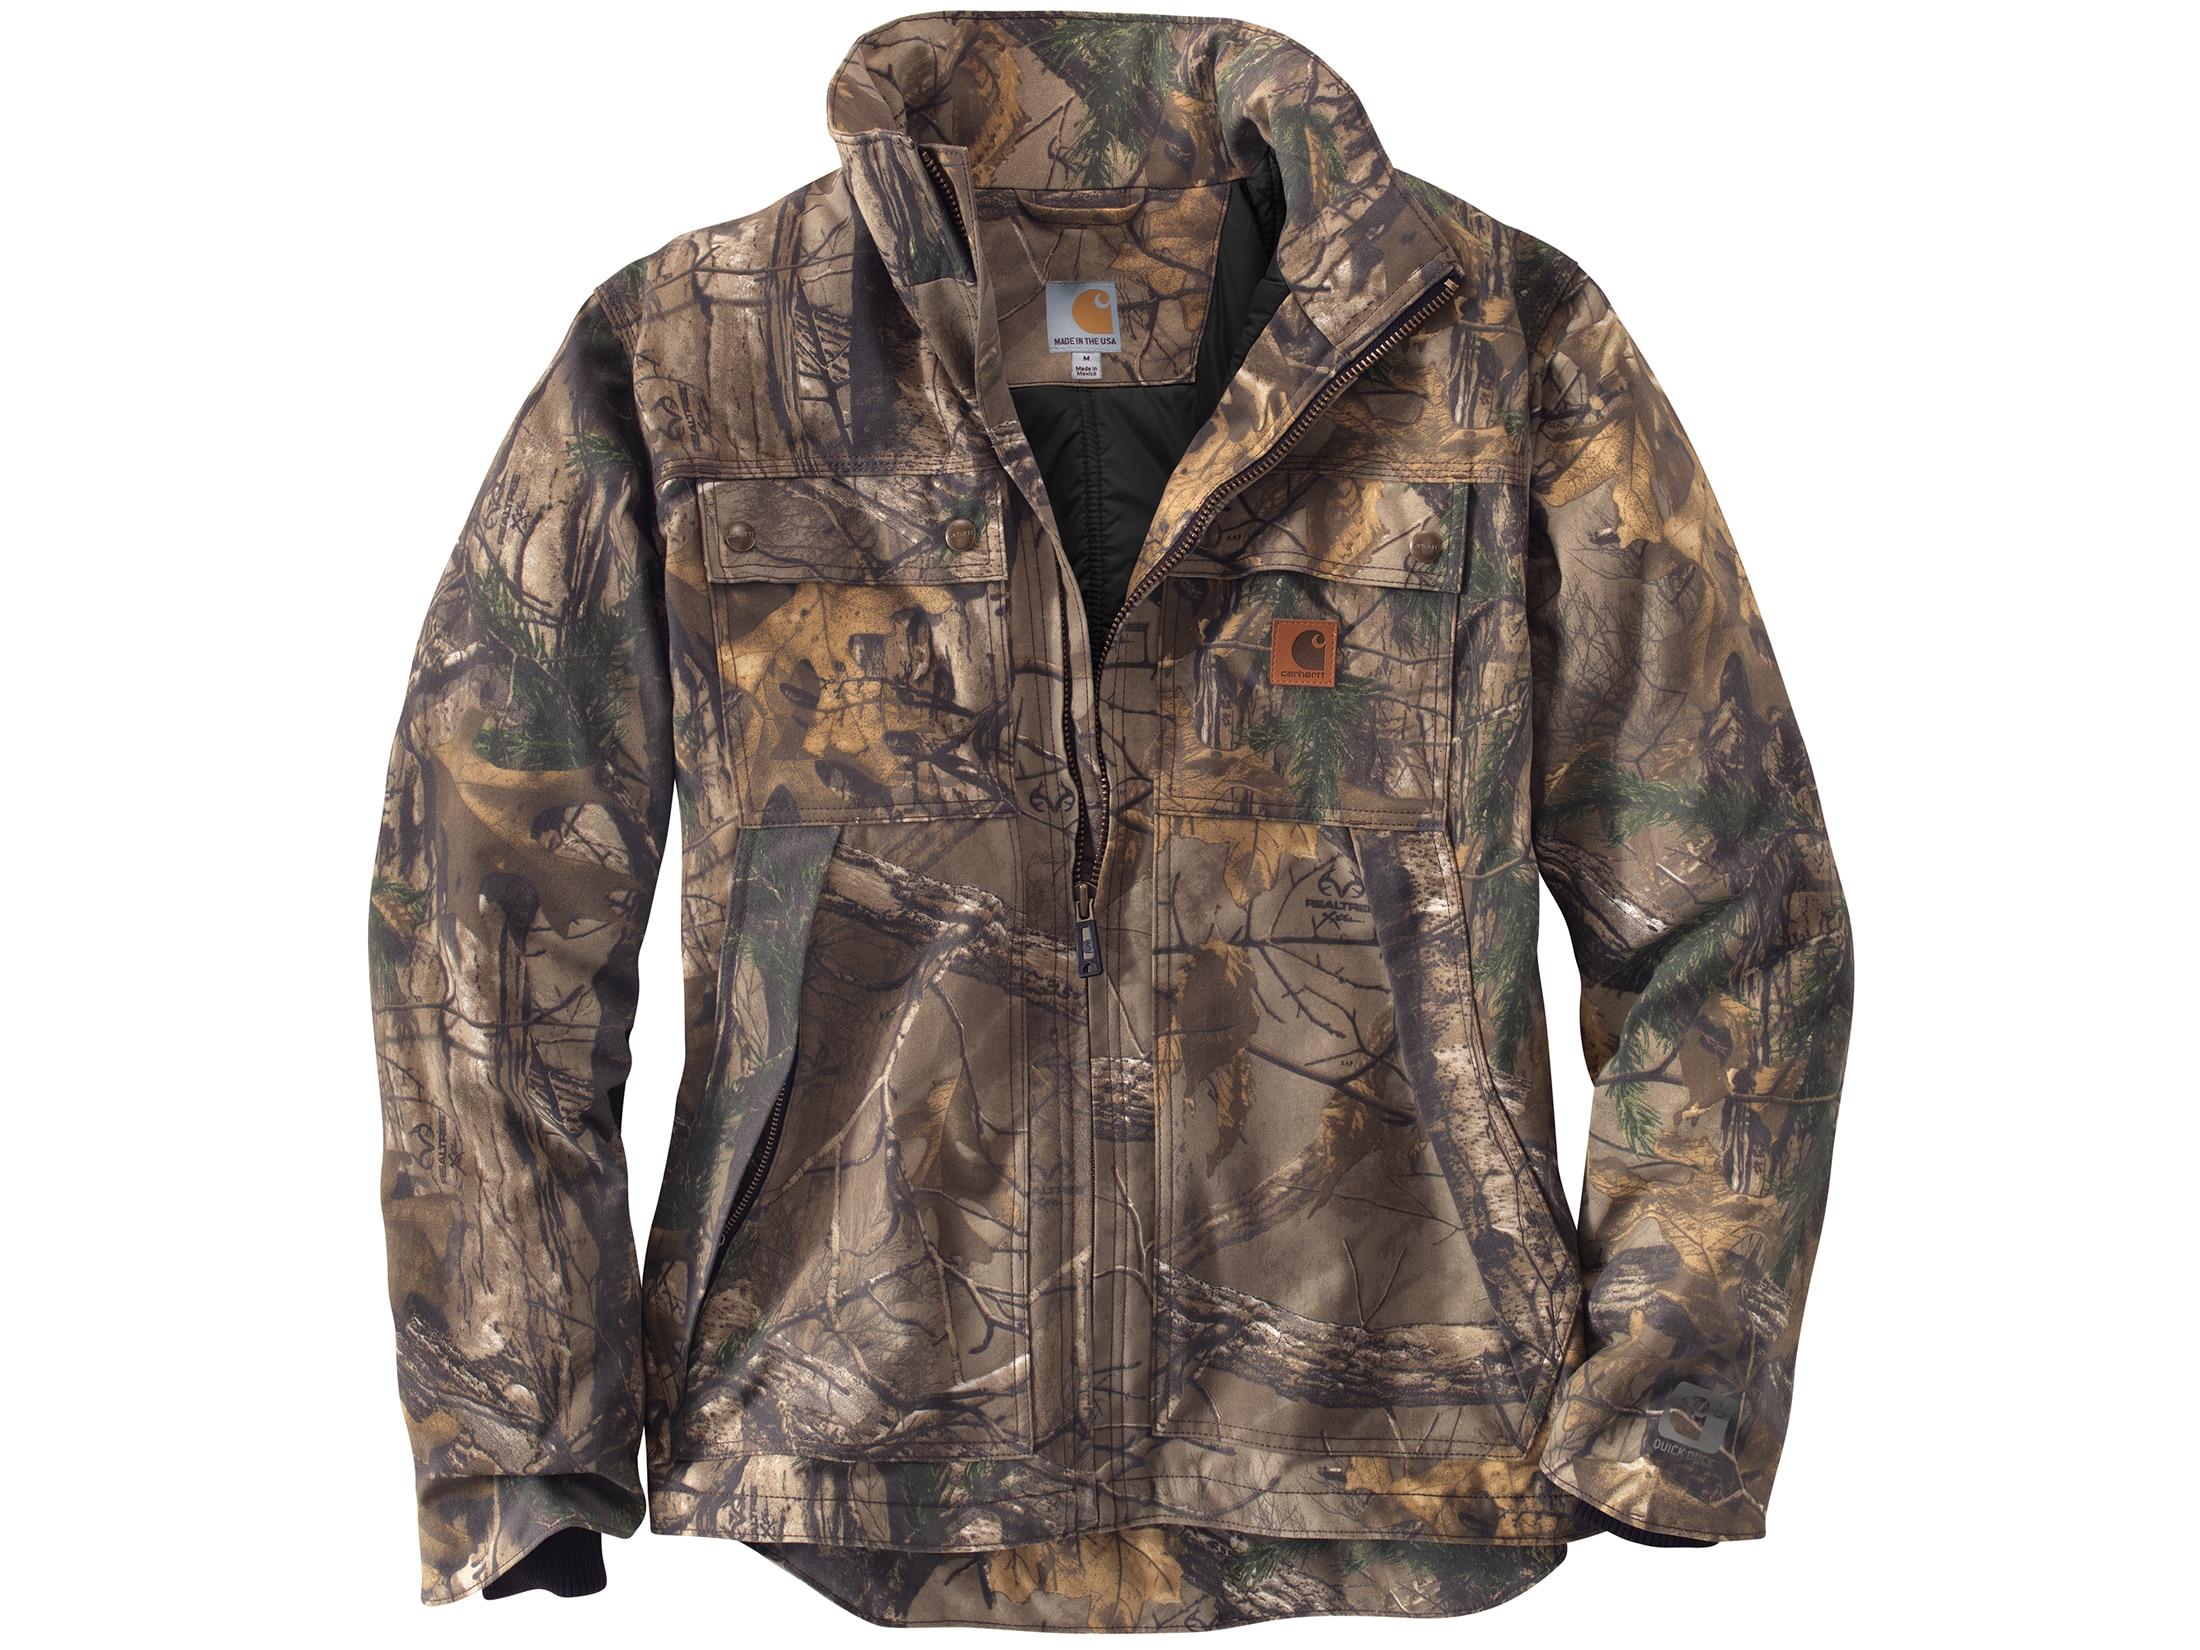 Carhartt 101444C Quick Duck Camo Traditional Jacket 977 Realtree Xtra